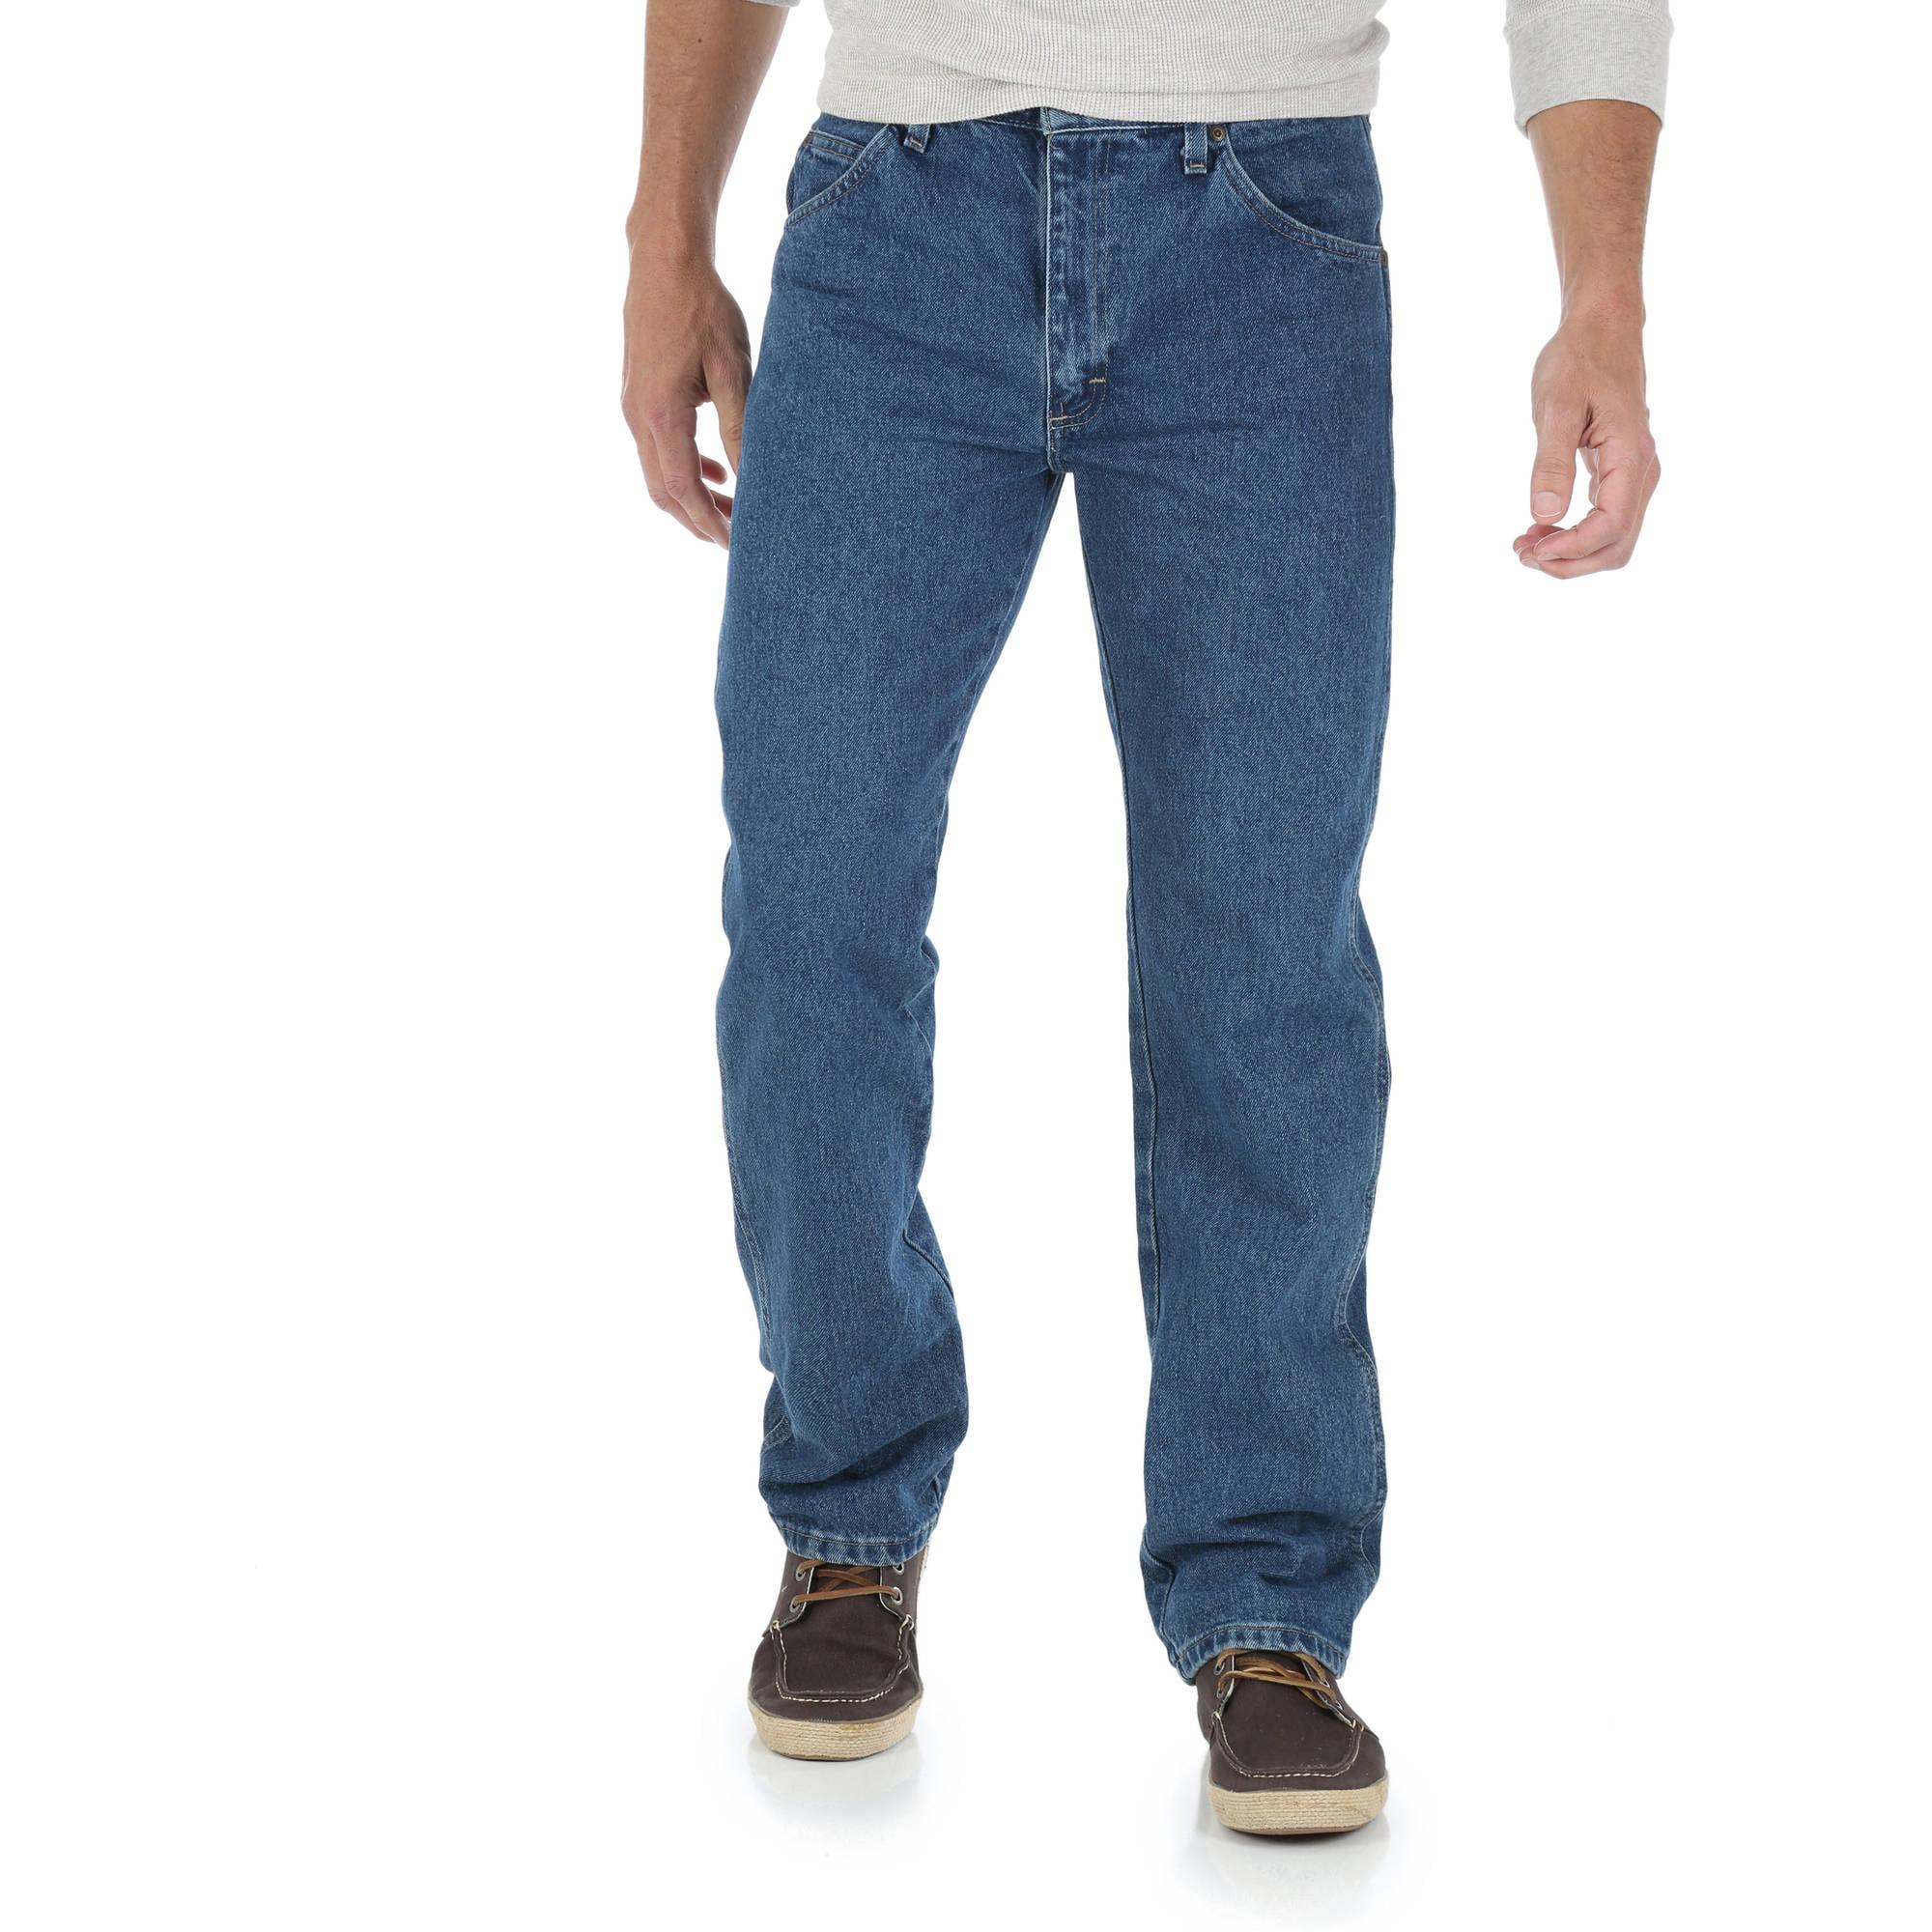 Mens Jeans Size 29 X 32